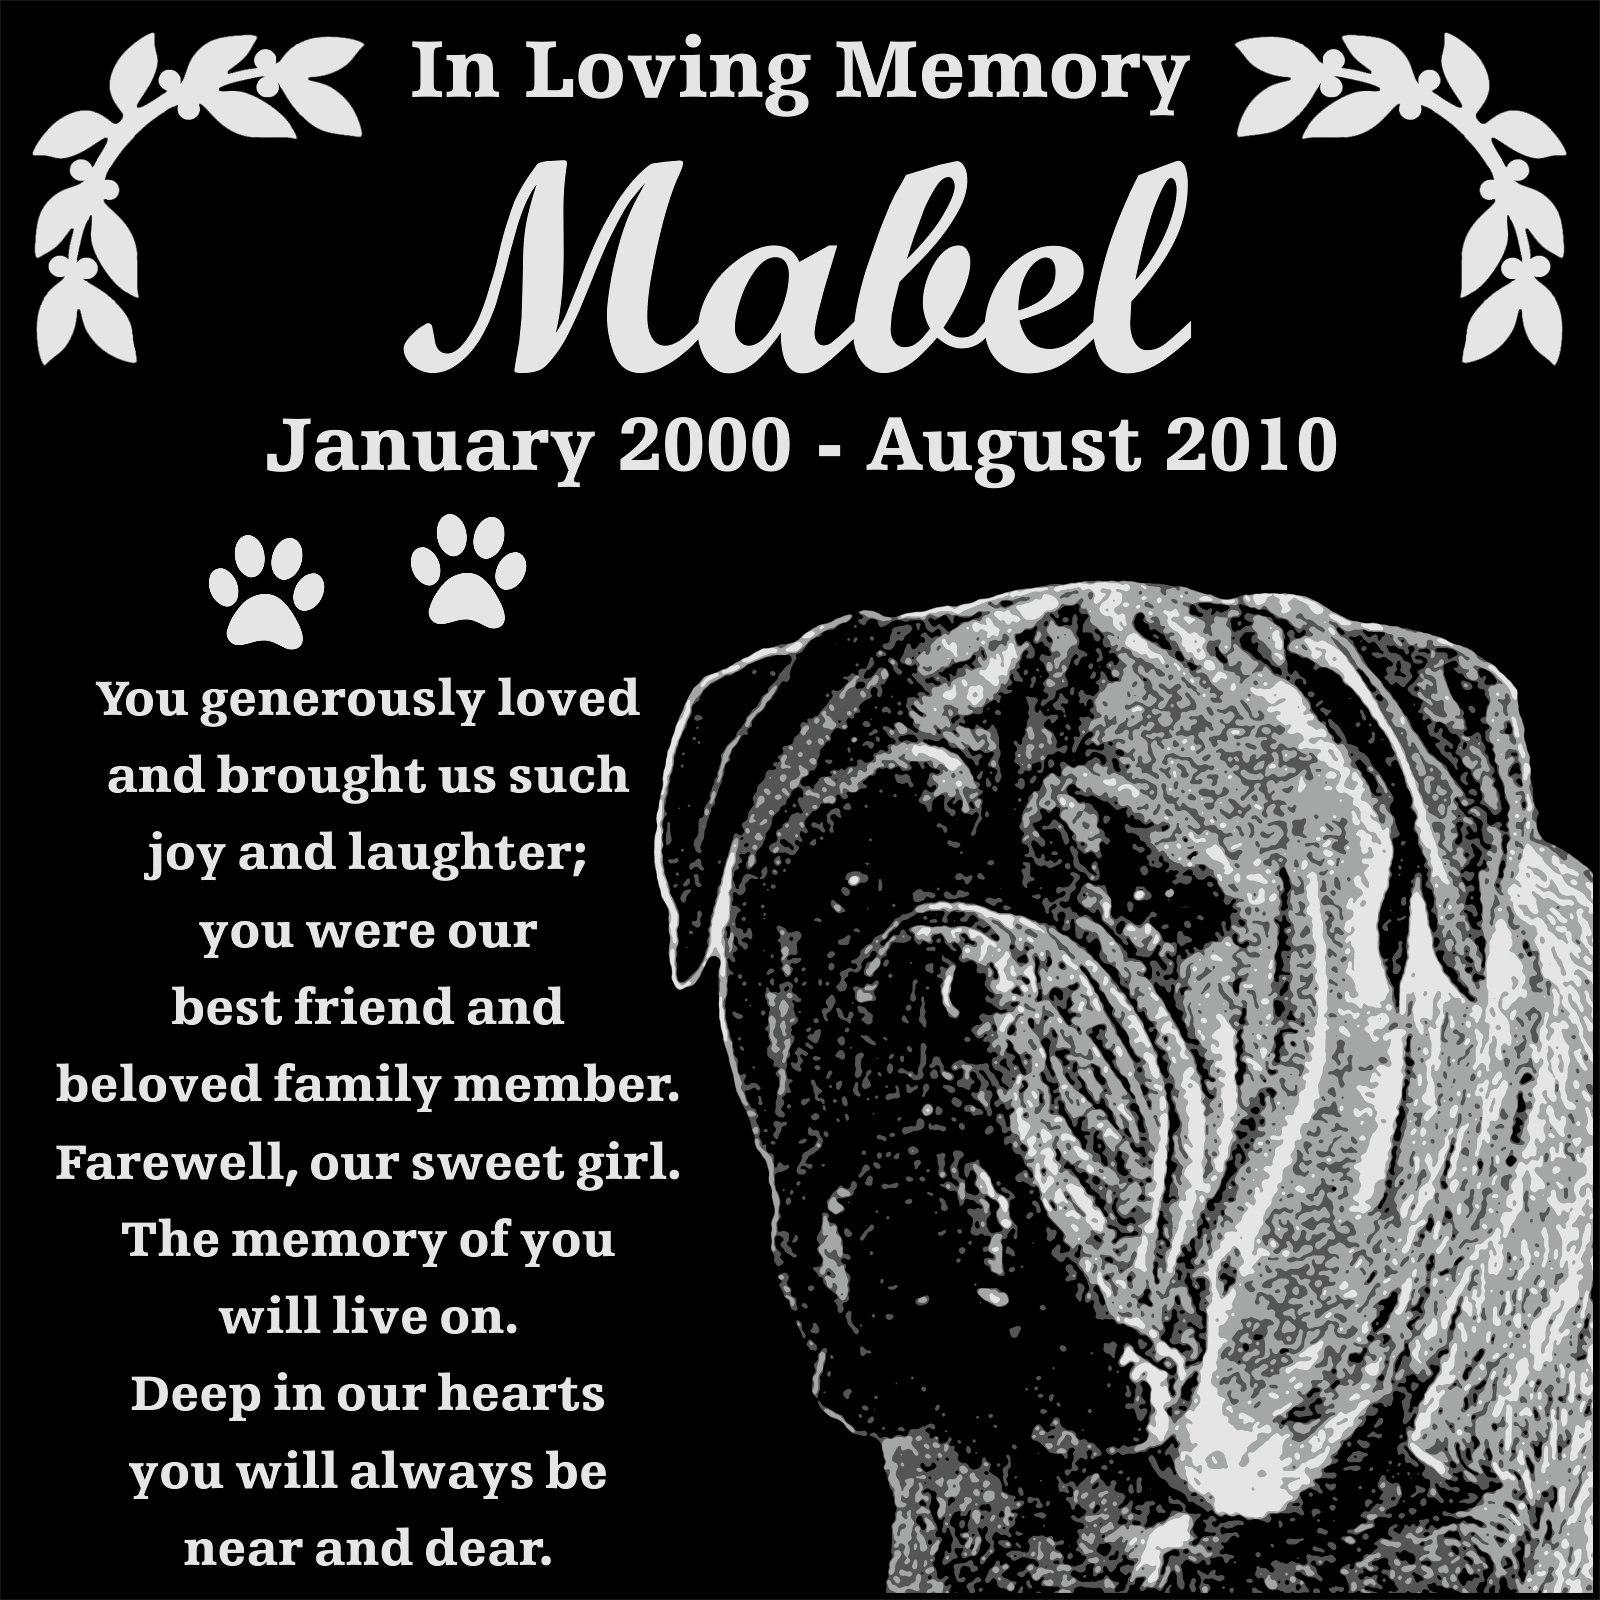 Personalized Bullmastiff Dog Pet Memorial 12''x12'' Engraved Black Granite Grave Marker Head Stone Plaque MAB1